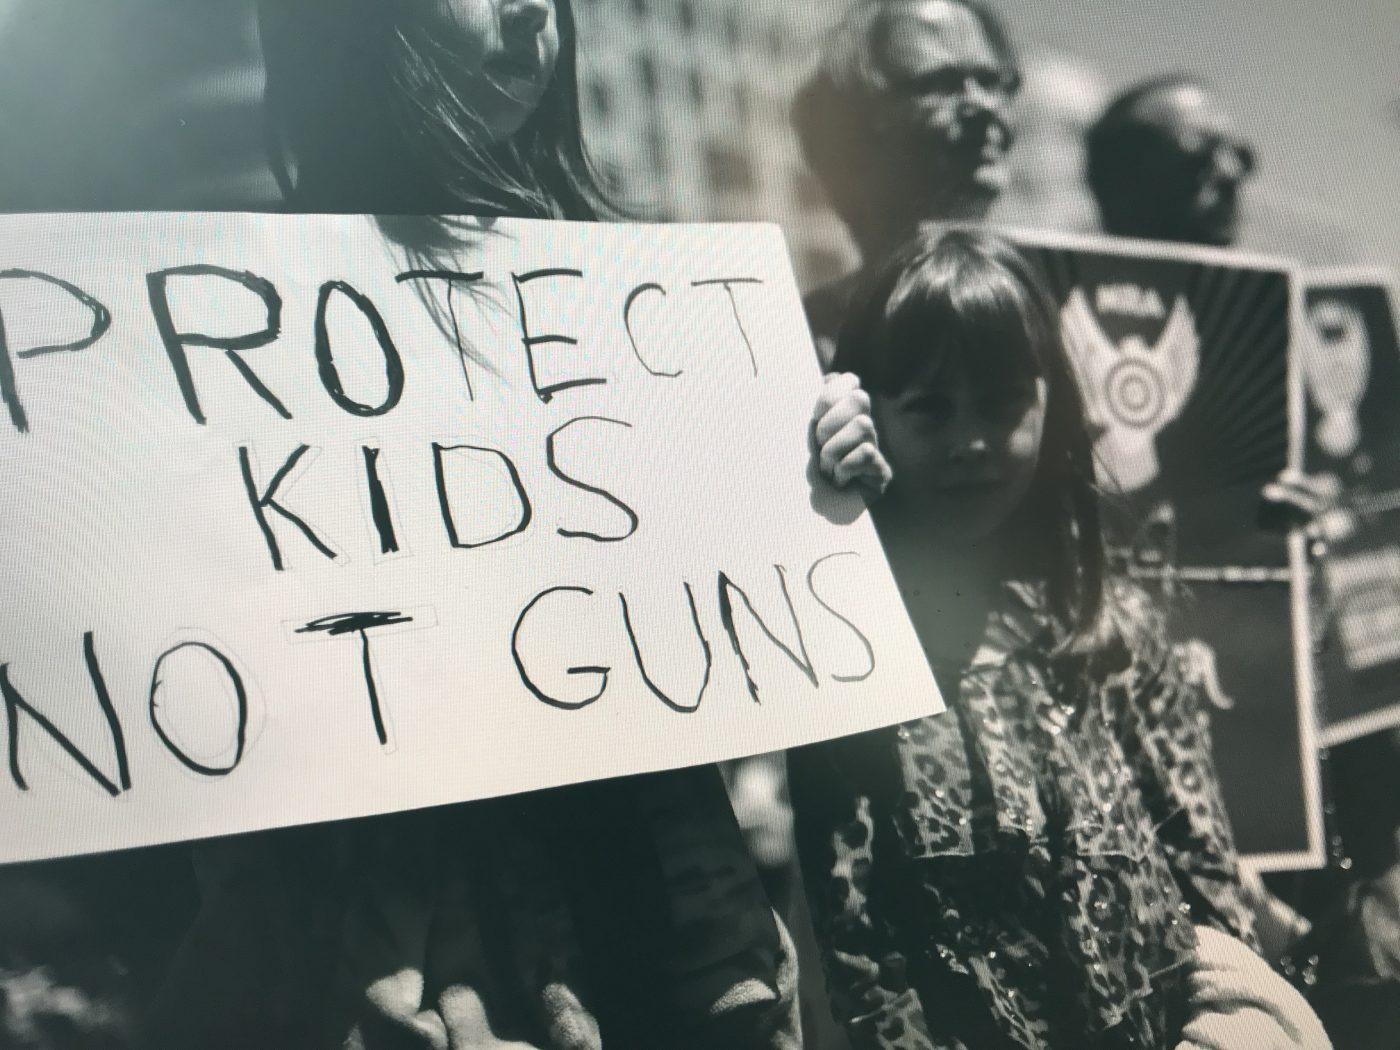 Protect Kids Not Guns